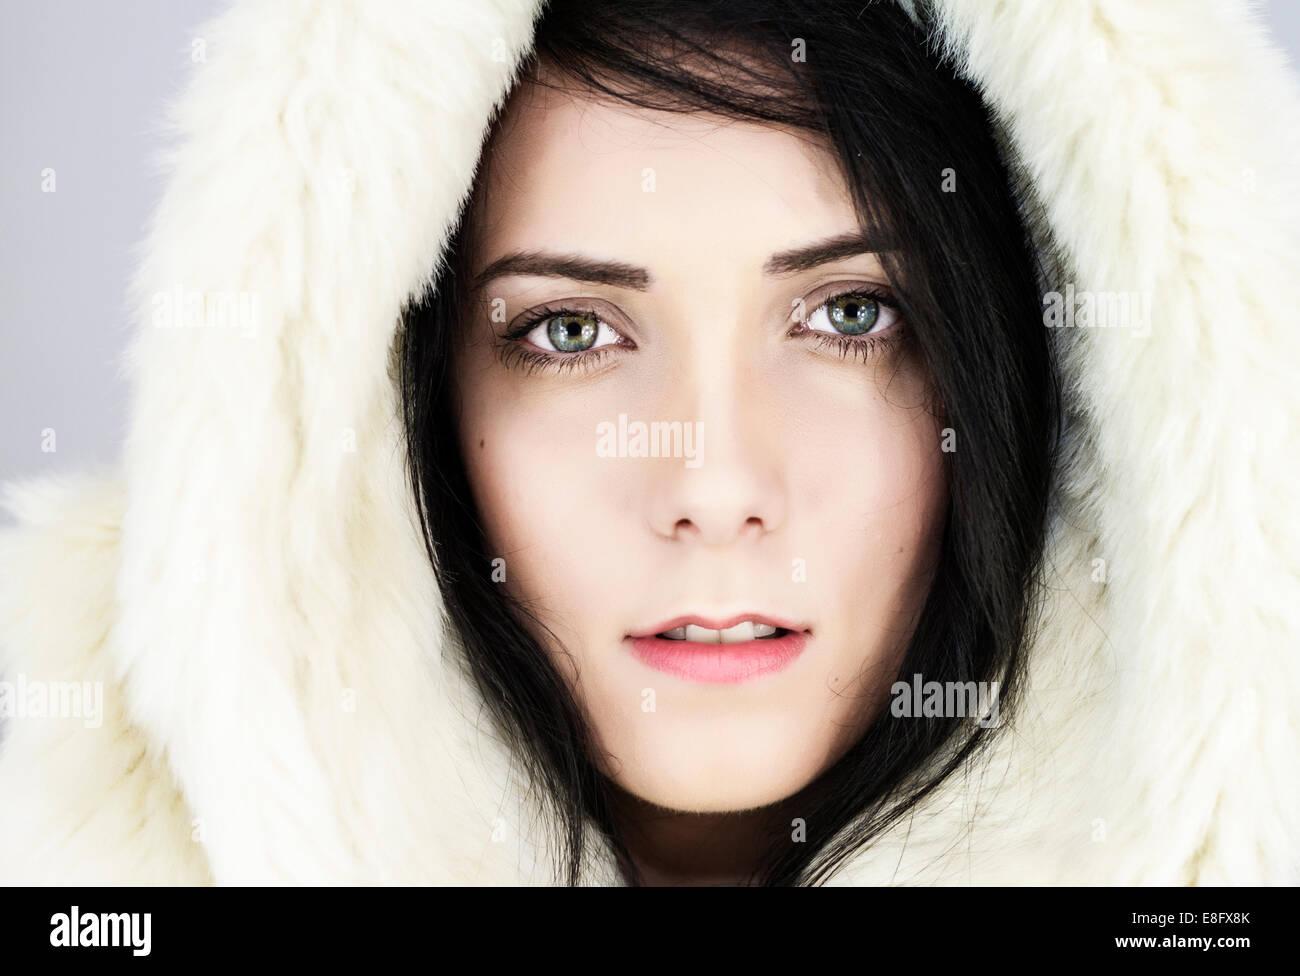 Woman with fur hood Photo Stock